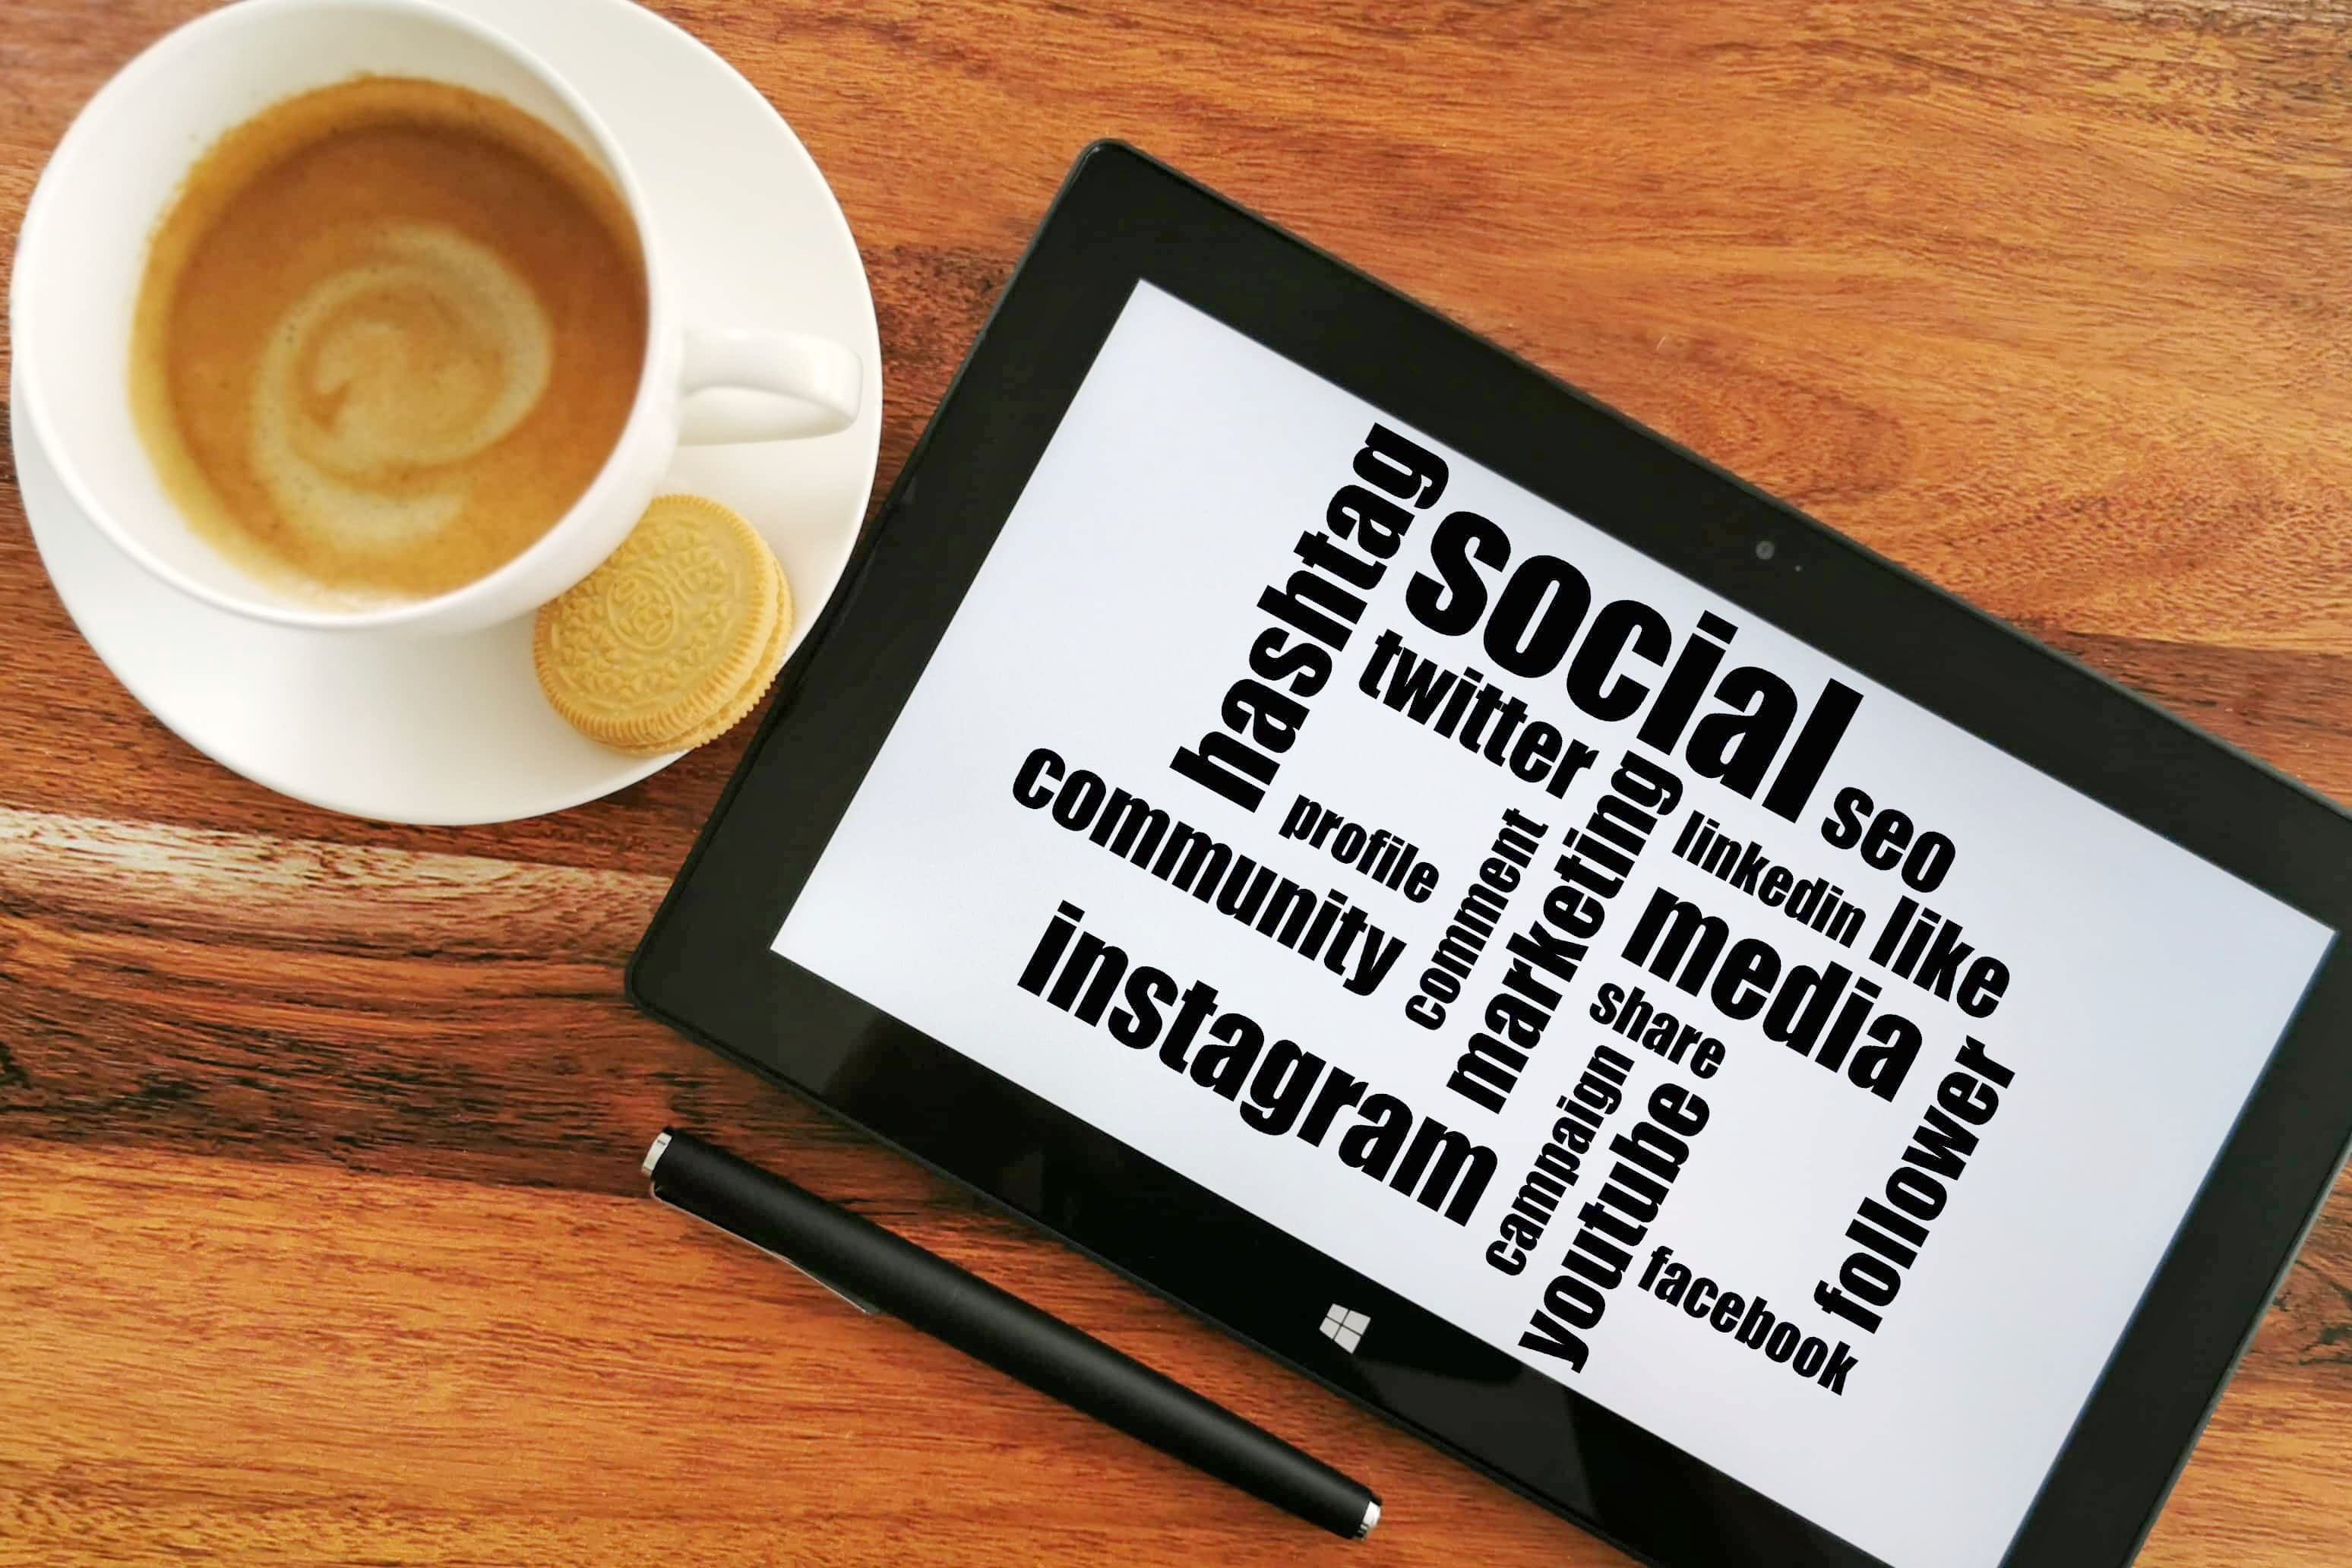 //aom.at/wp-content/uploads/2020/03/Social-Media-Manager.jpg